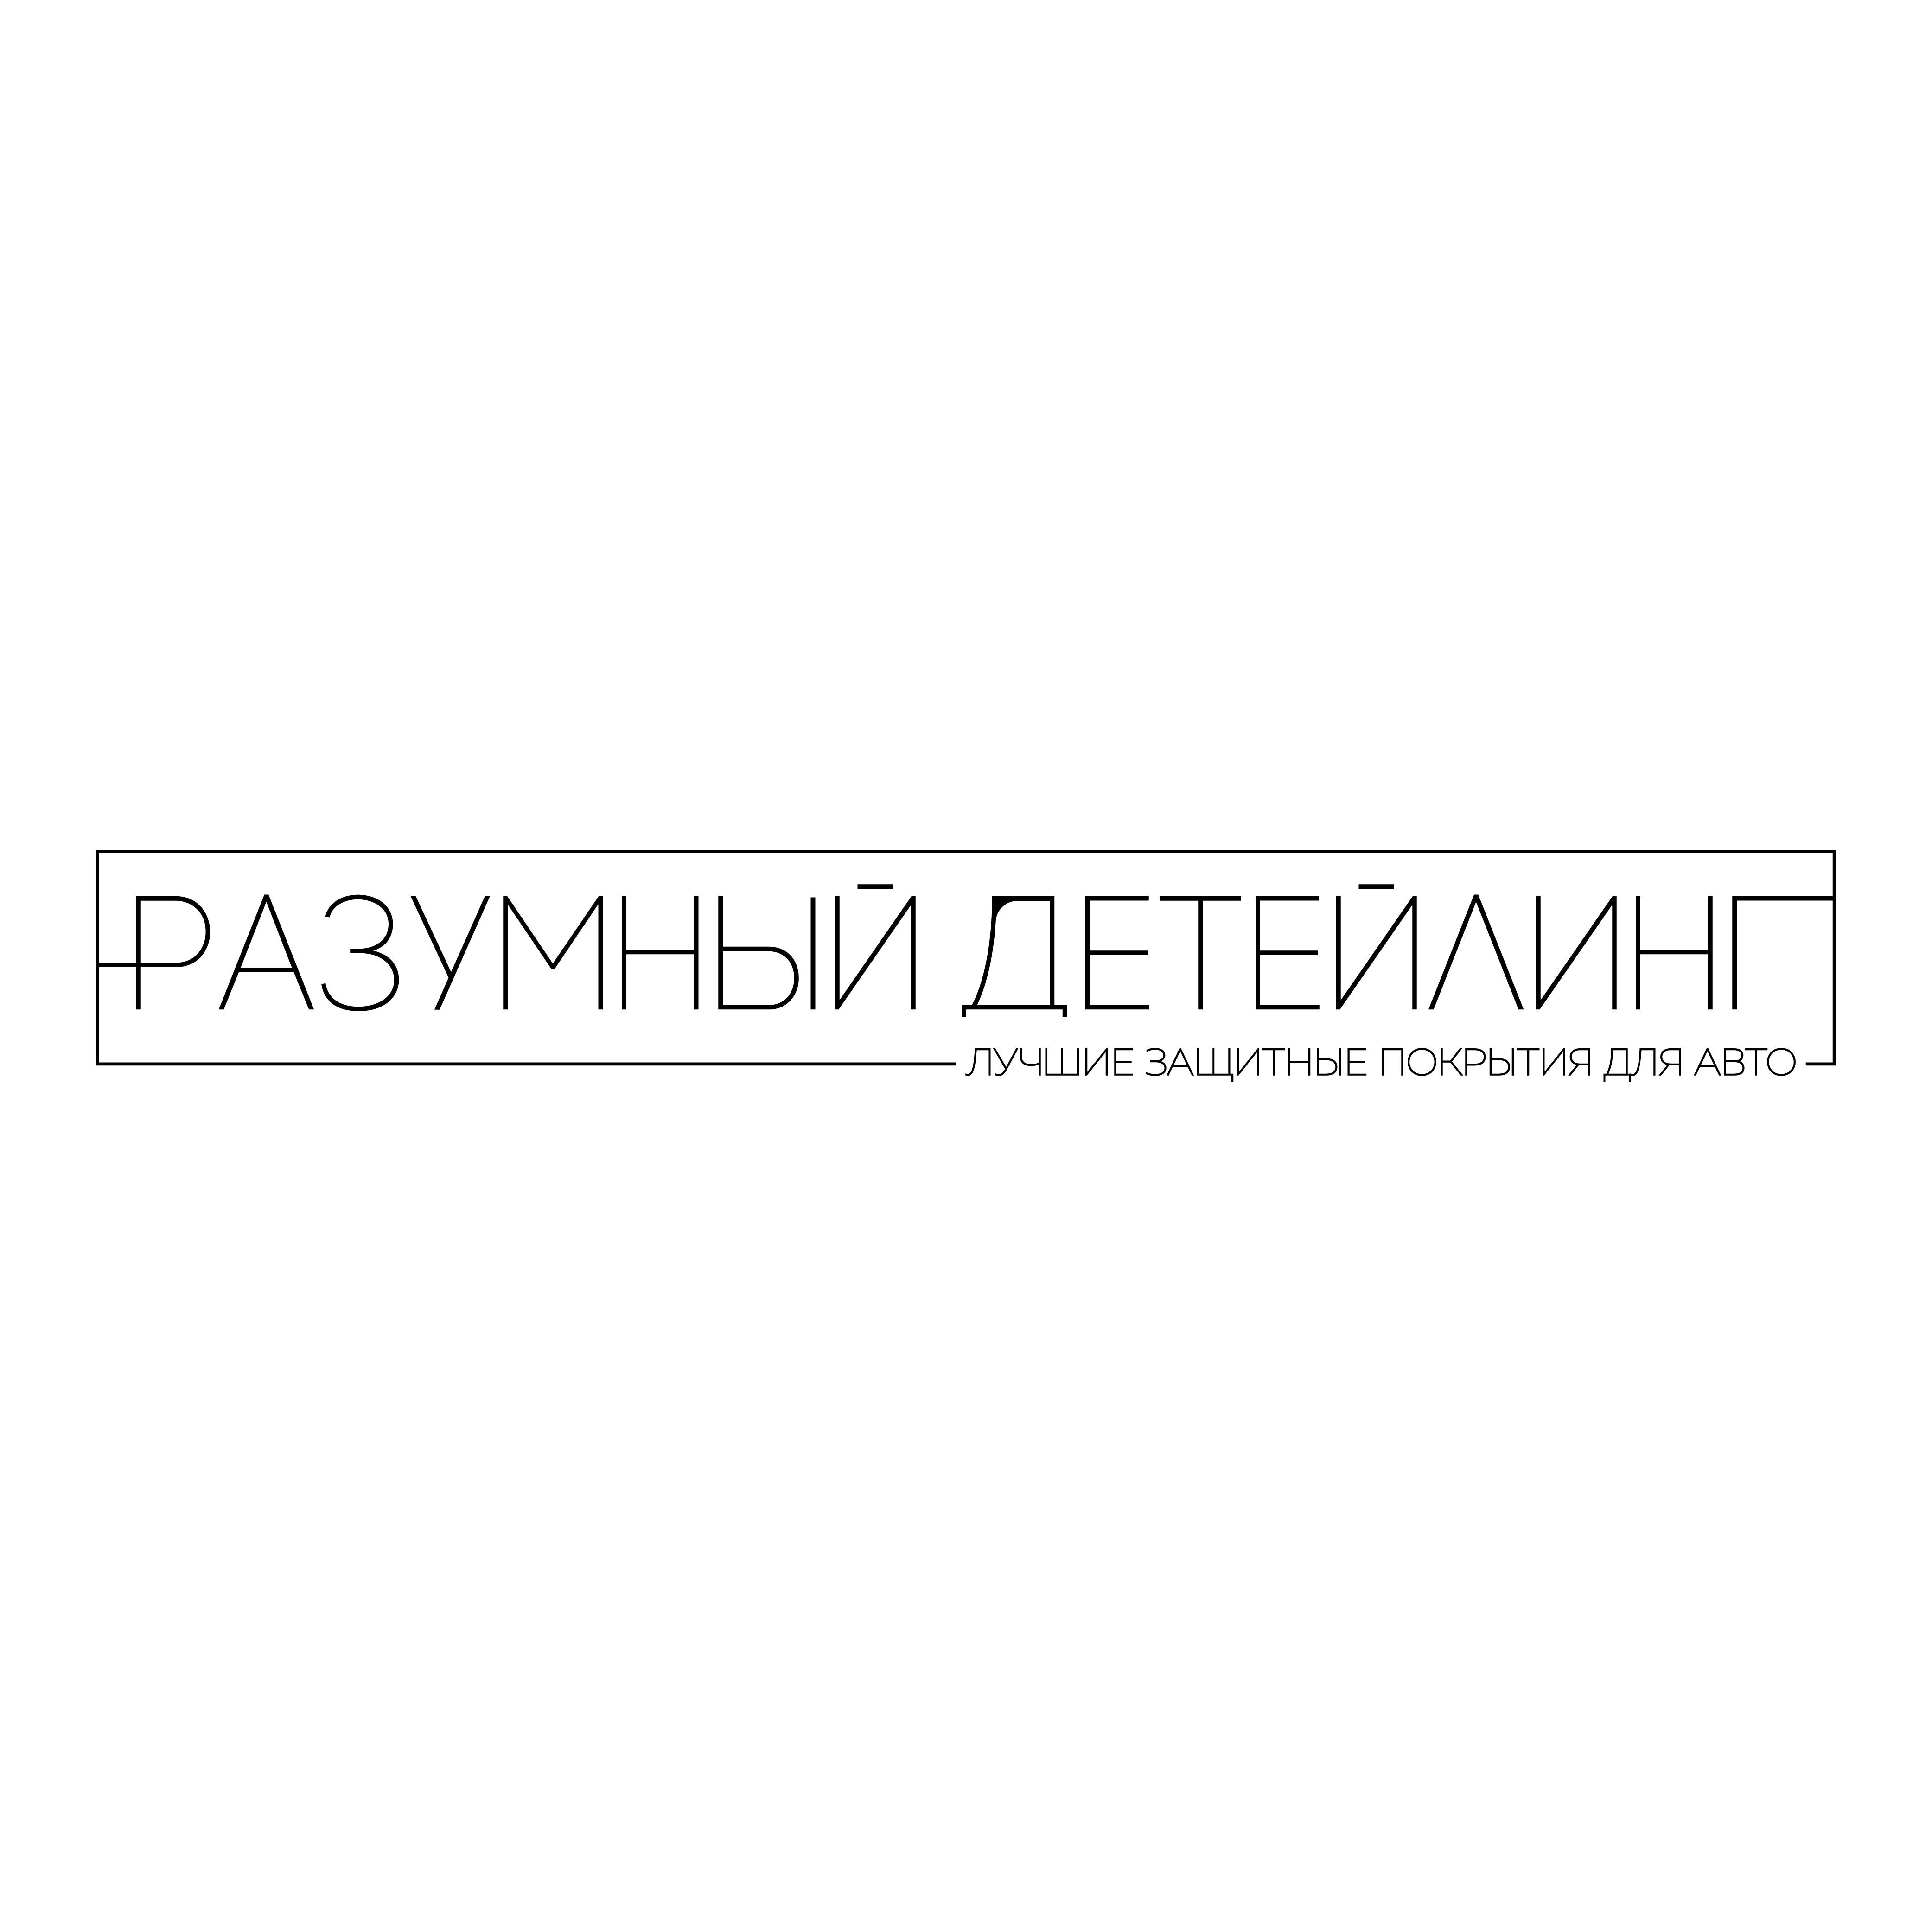 Ребрендинг логотипа  фото f_2825ad090e763f09.jpg